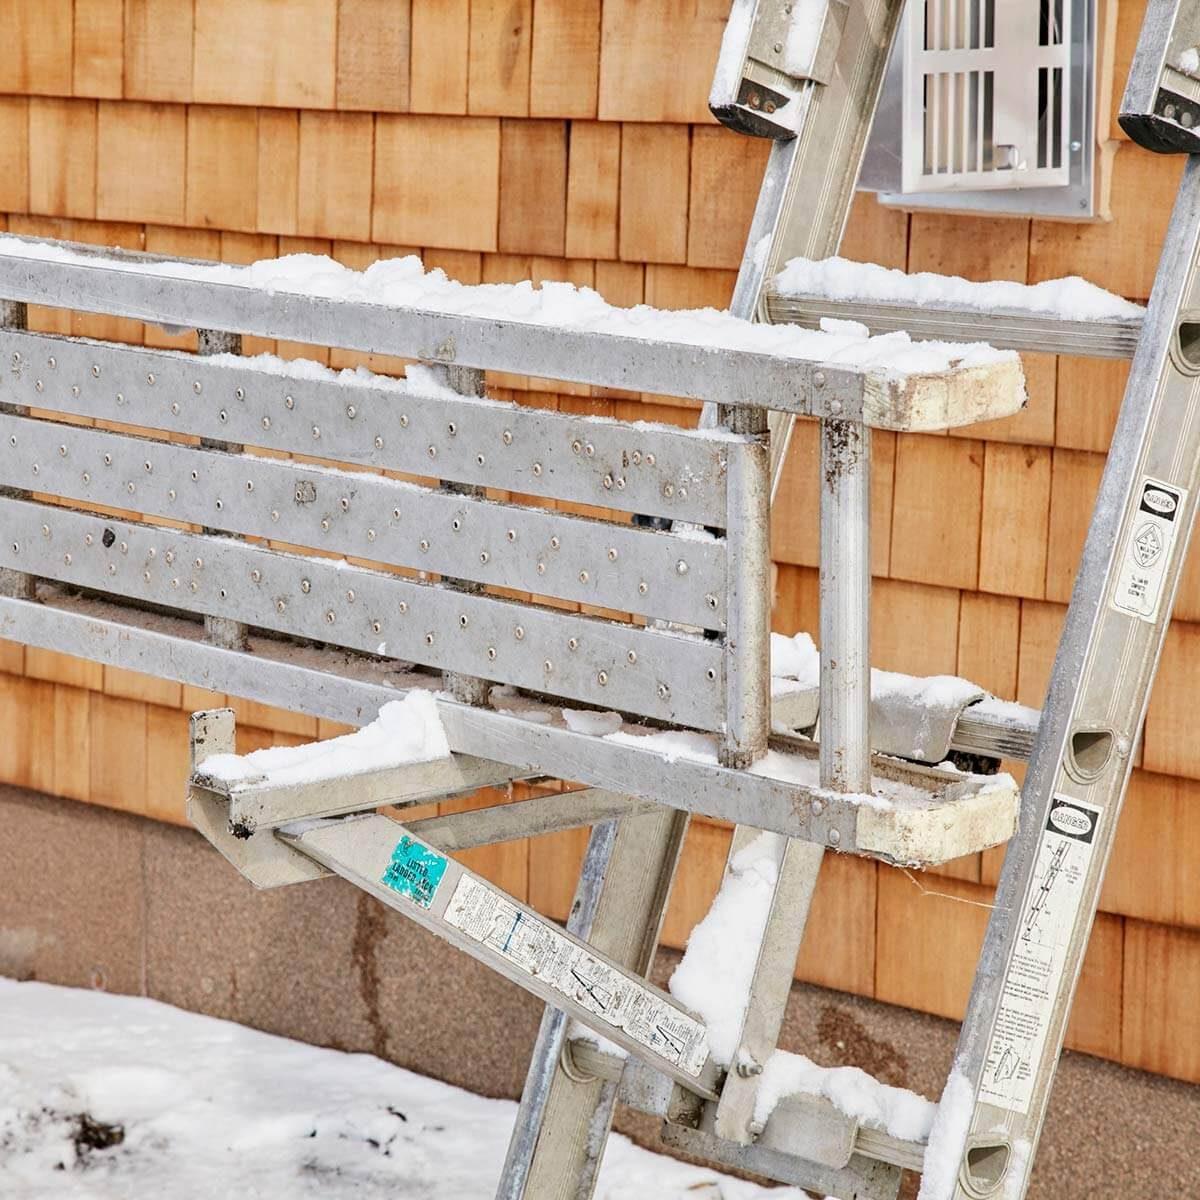 Ice-free planks